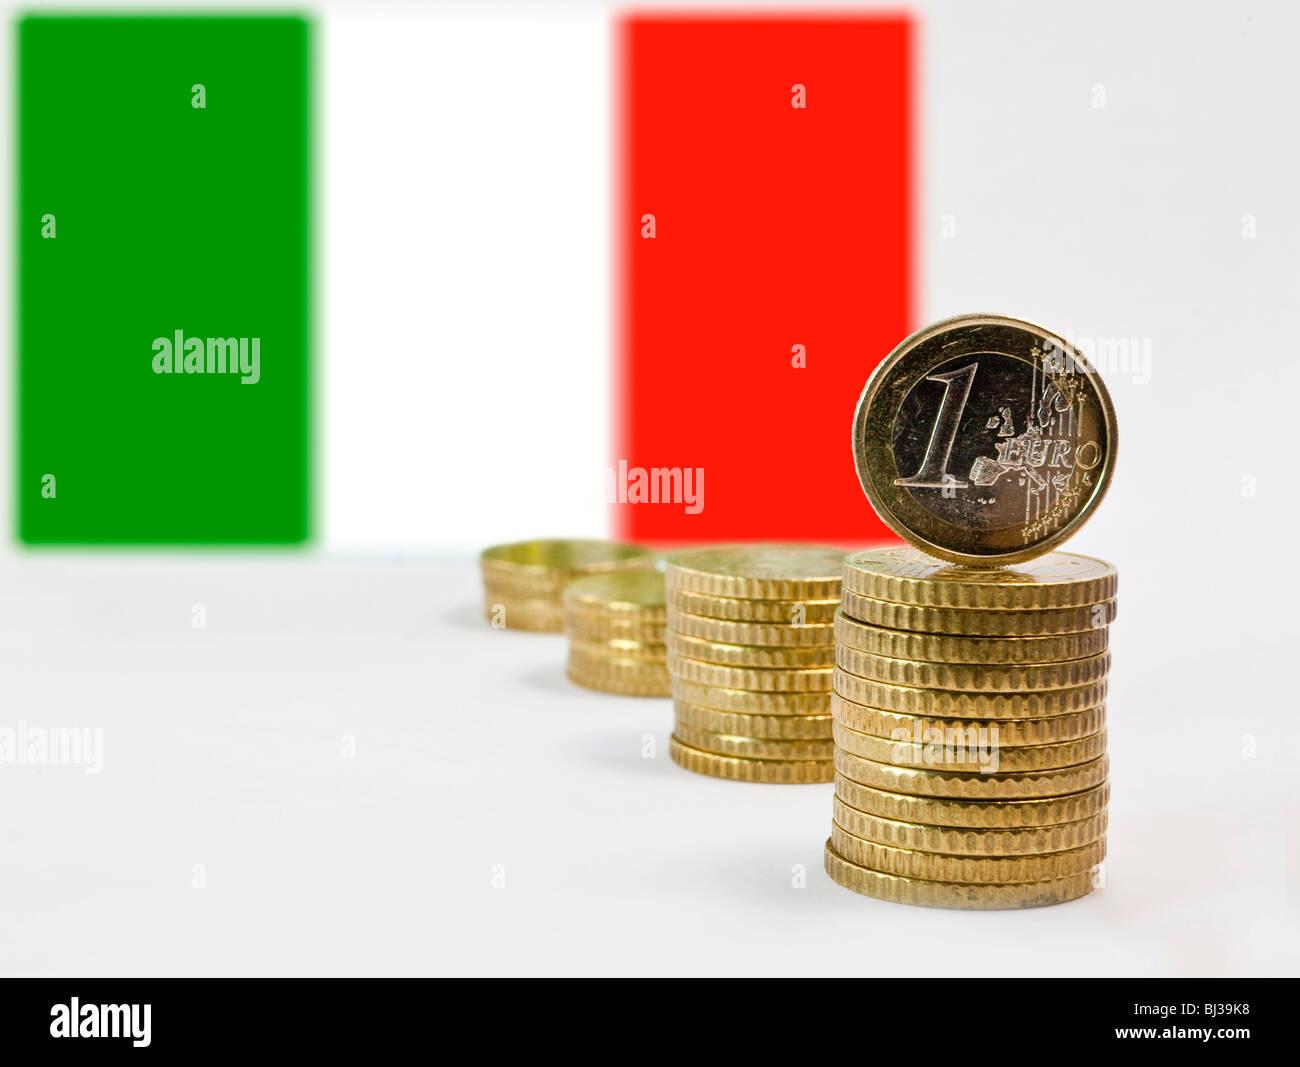 Italian Flag, Italy and the Euro - Stock Image